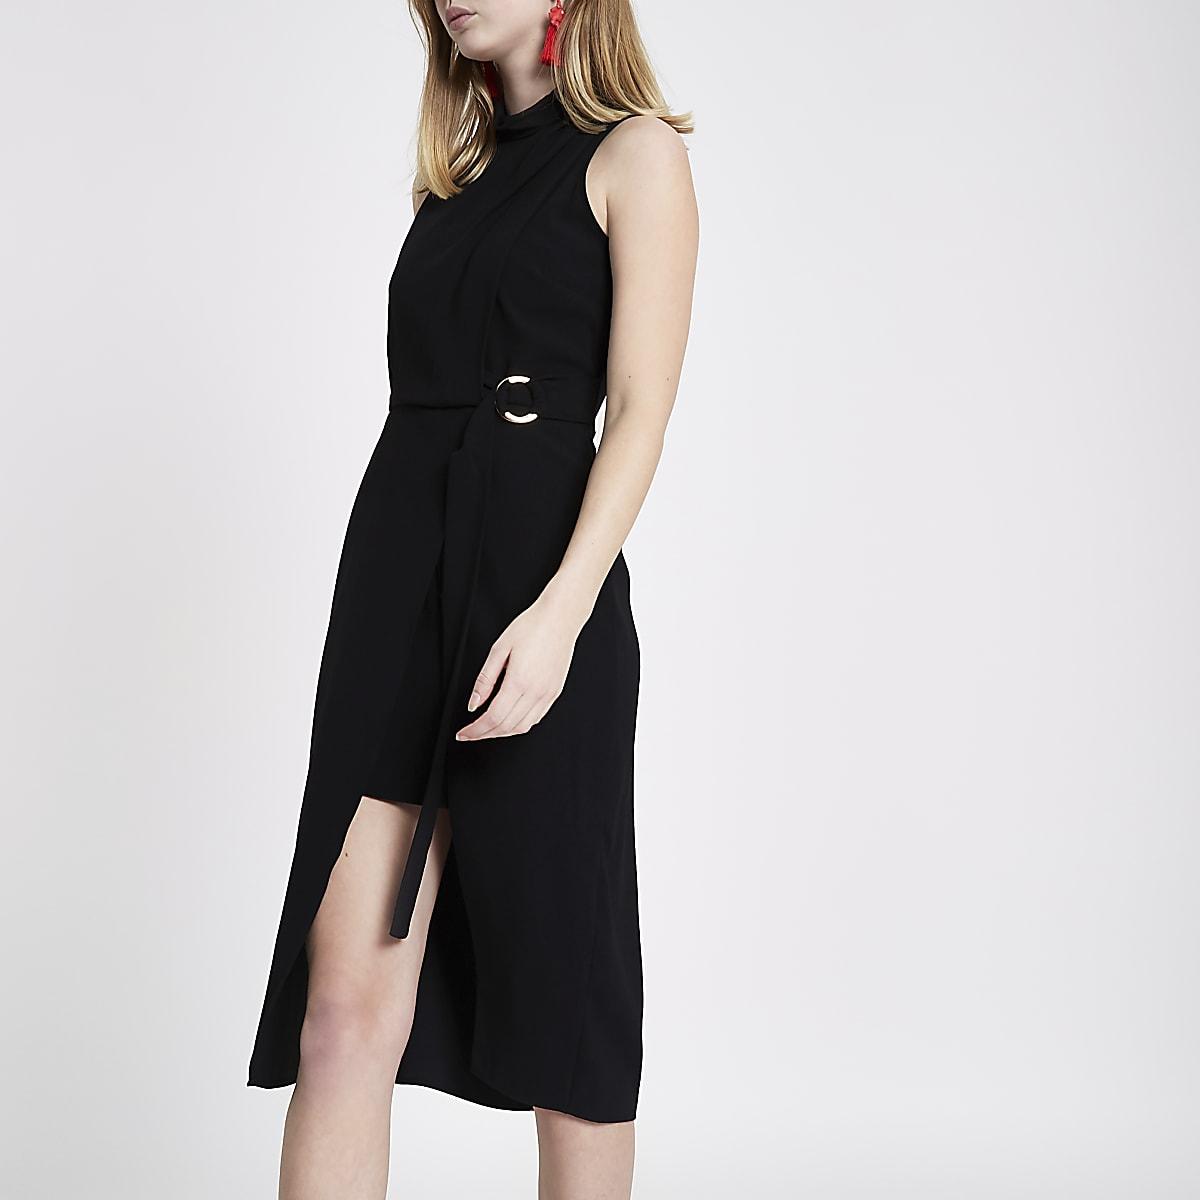 e56e5300237e Black high neck sleeveless midi dress - Midi Dresses - Dresses - women